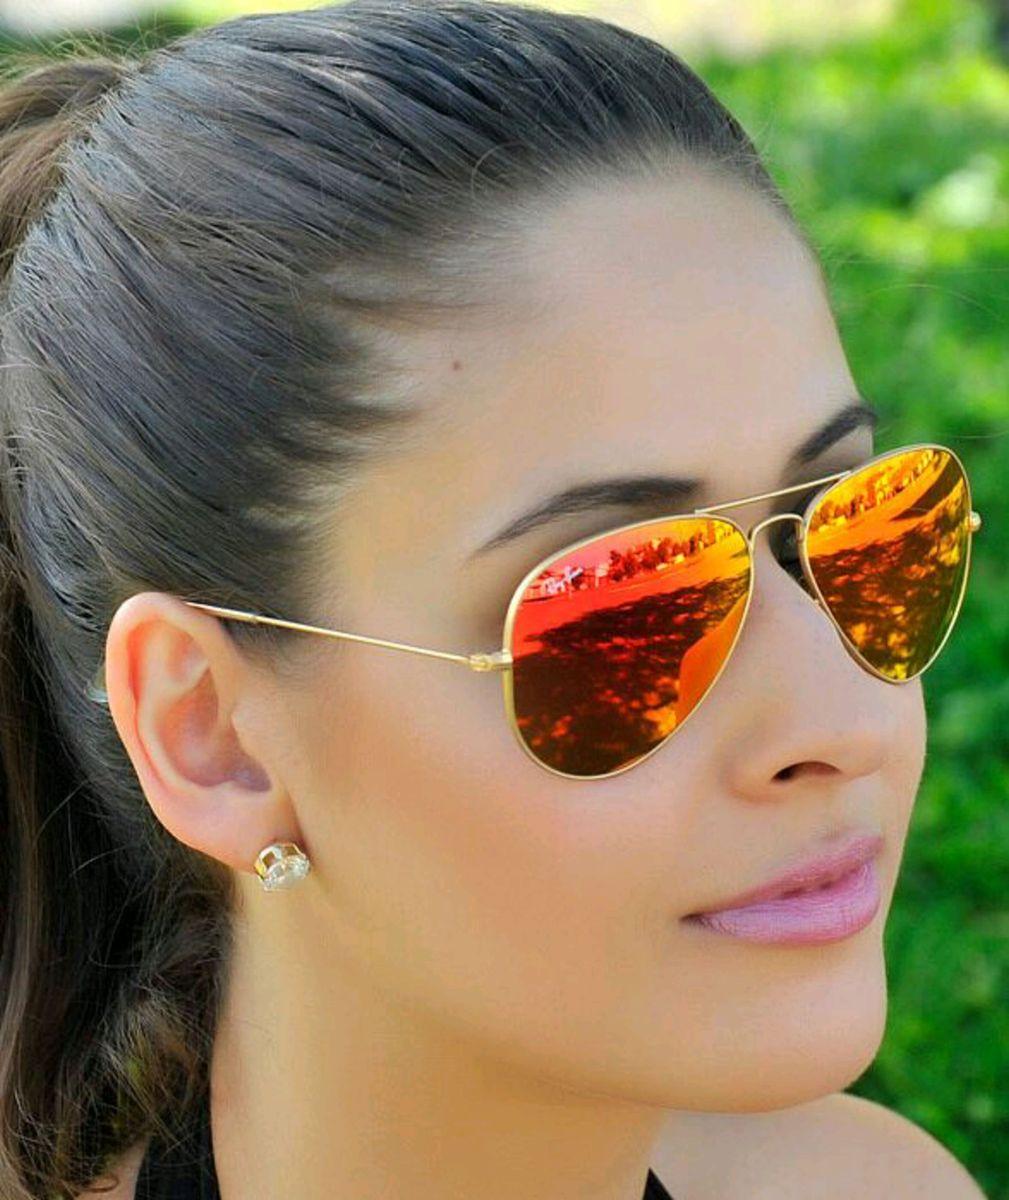 46940848f1fa4 aviador laranja espelhado - óculos sem-marca.  Czm6ly9wag90b3muzw5qb2vplmnvbs5ici9wcm9kdwn0cy80odaxnzu3lzzlnwu4ztq3ytcxzjk2n2e2mty2ymzkzdq2ogq4yjg2lmpwzw